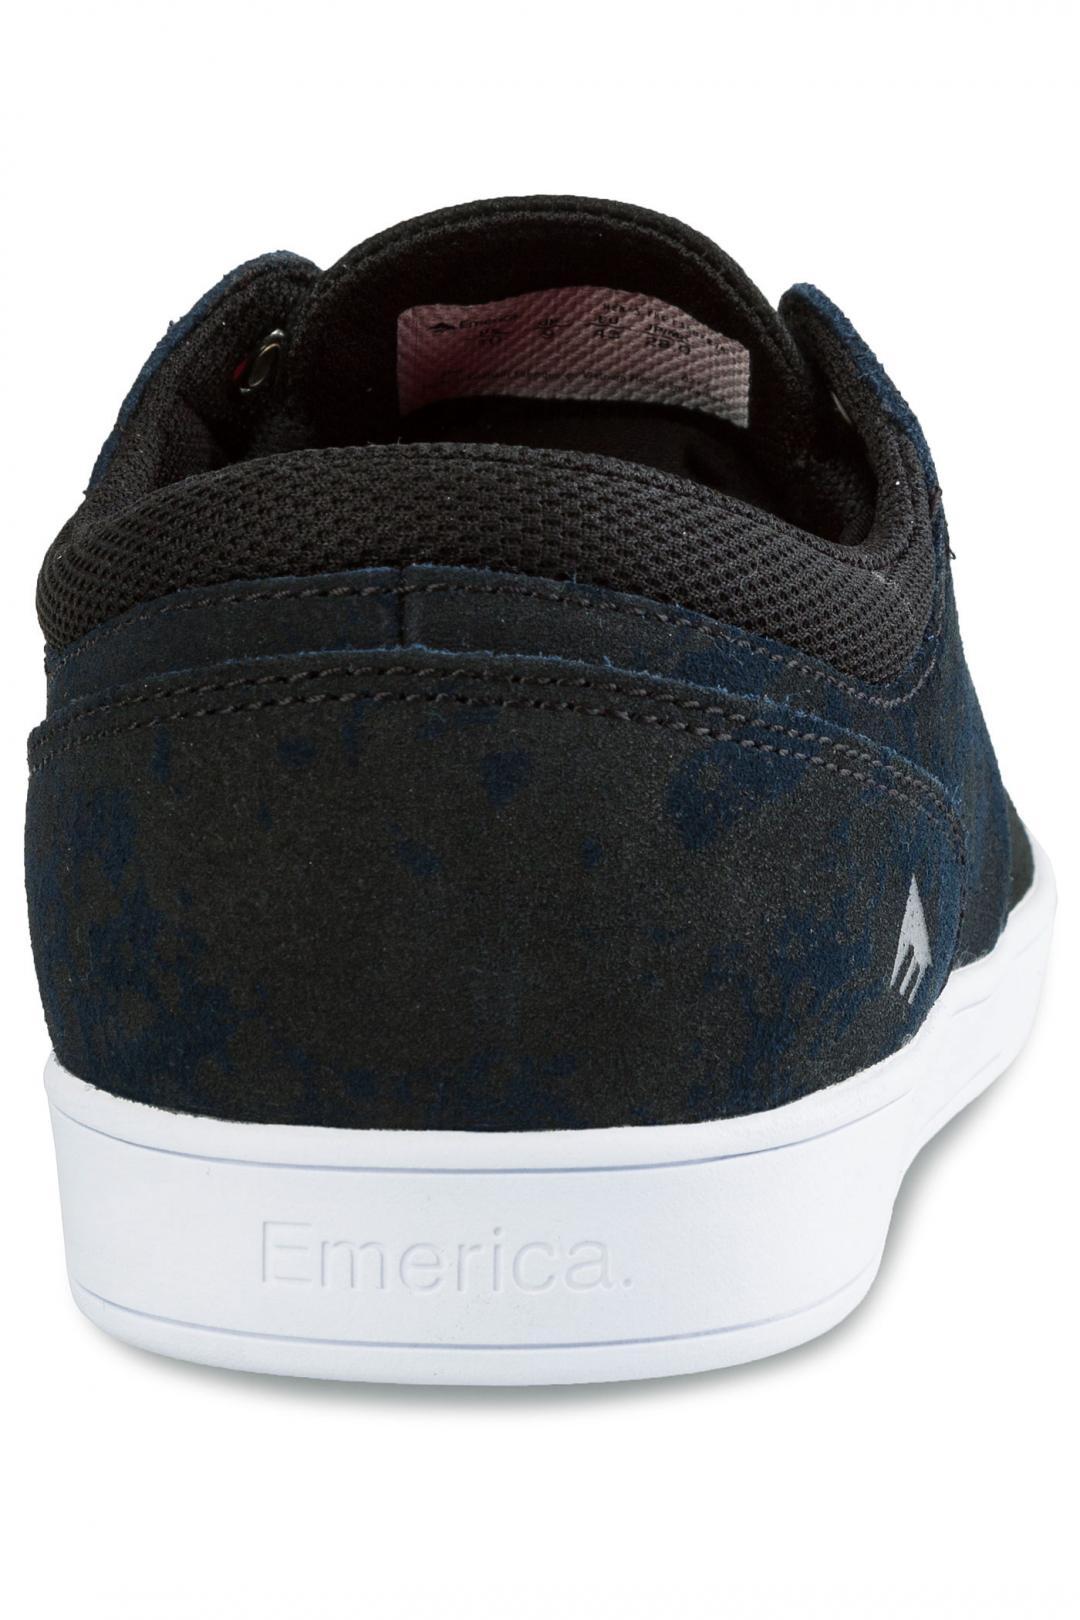 Uomo Emerica The Figueroa navy black | Scarpe da skate